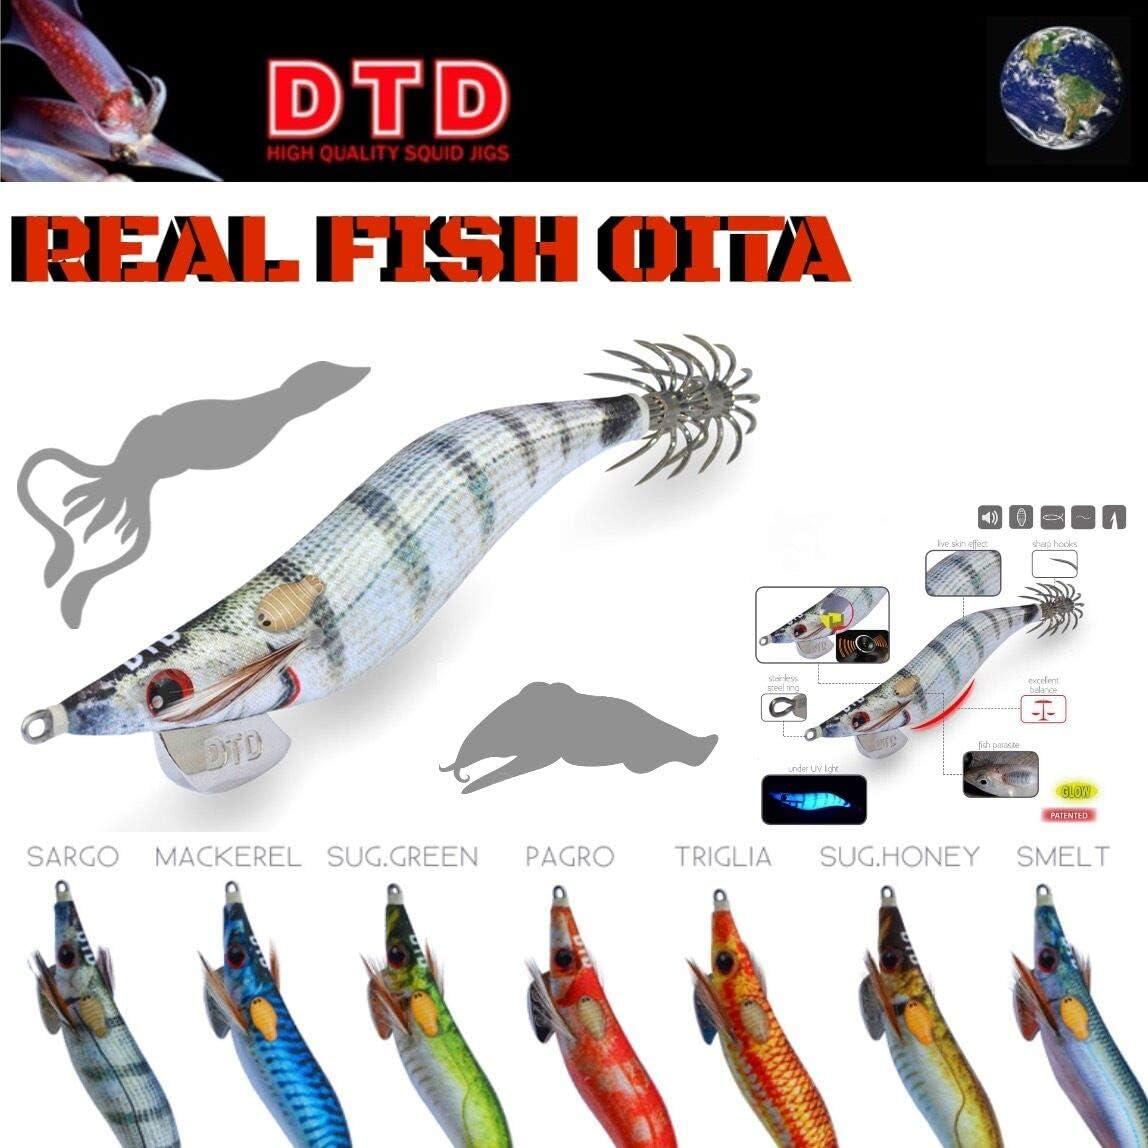 DTD JIBIONERA Real Fish Oita - 7.5CM - Smelt, 05, 7.5, 2.5, 6.5